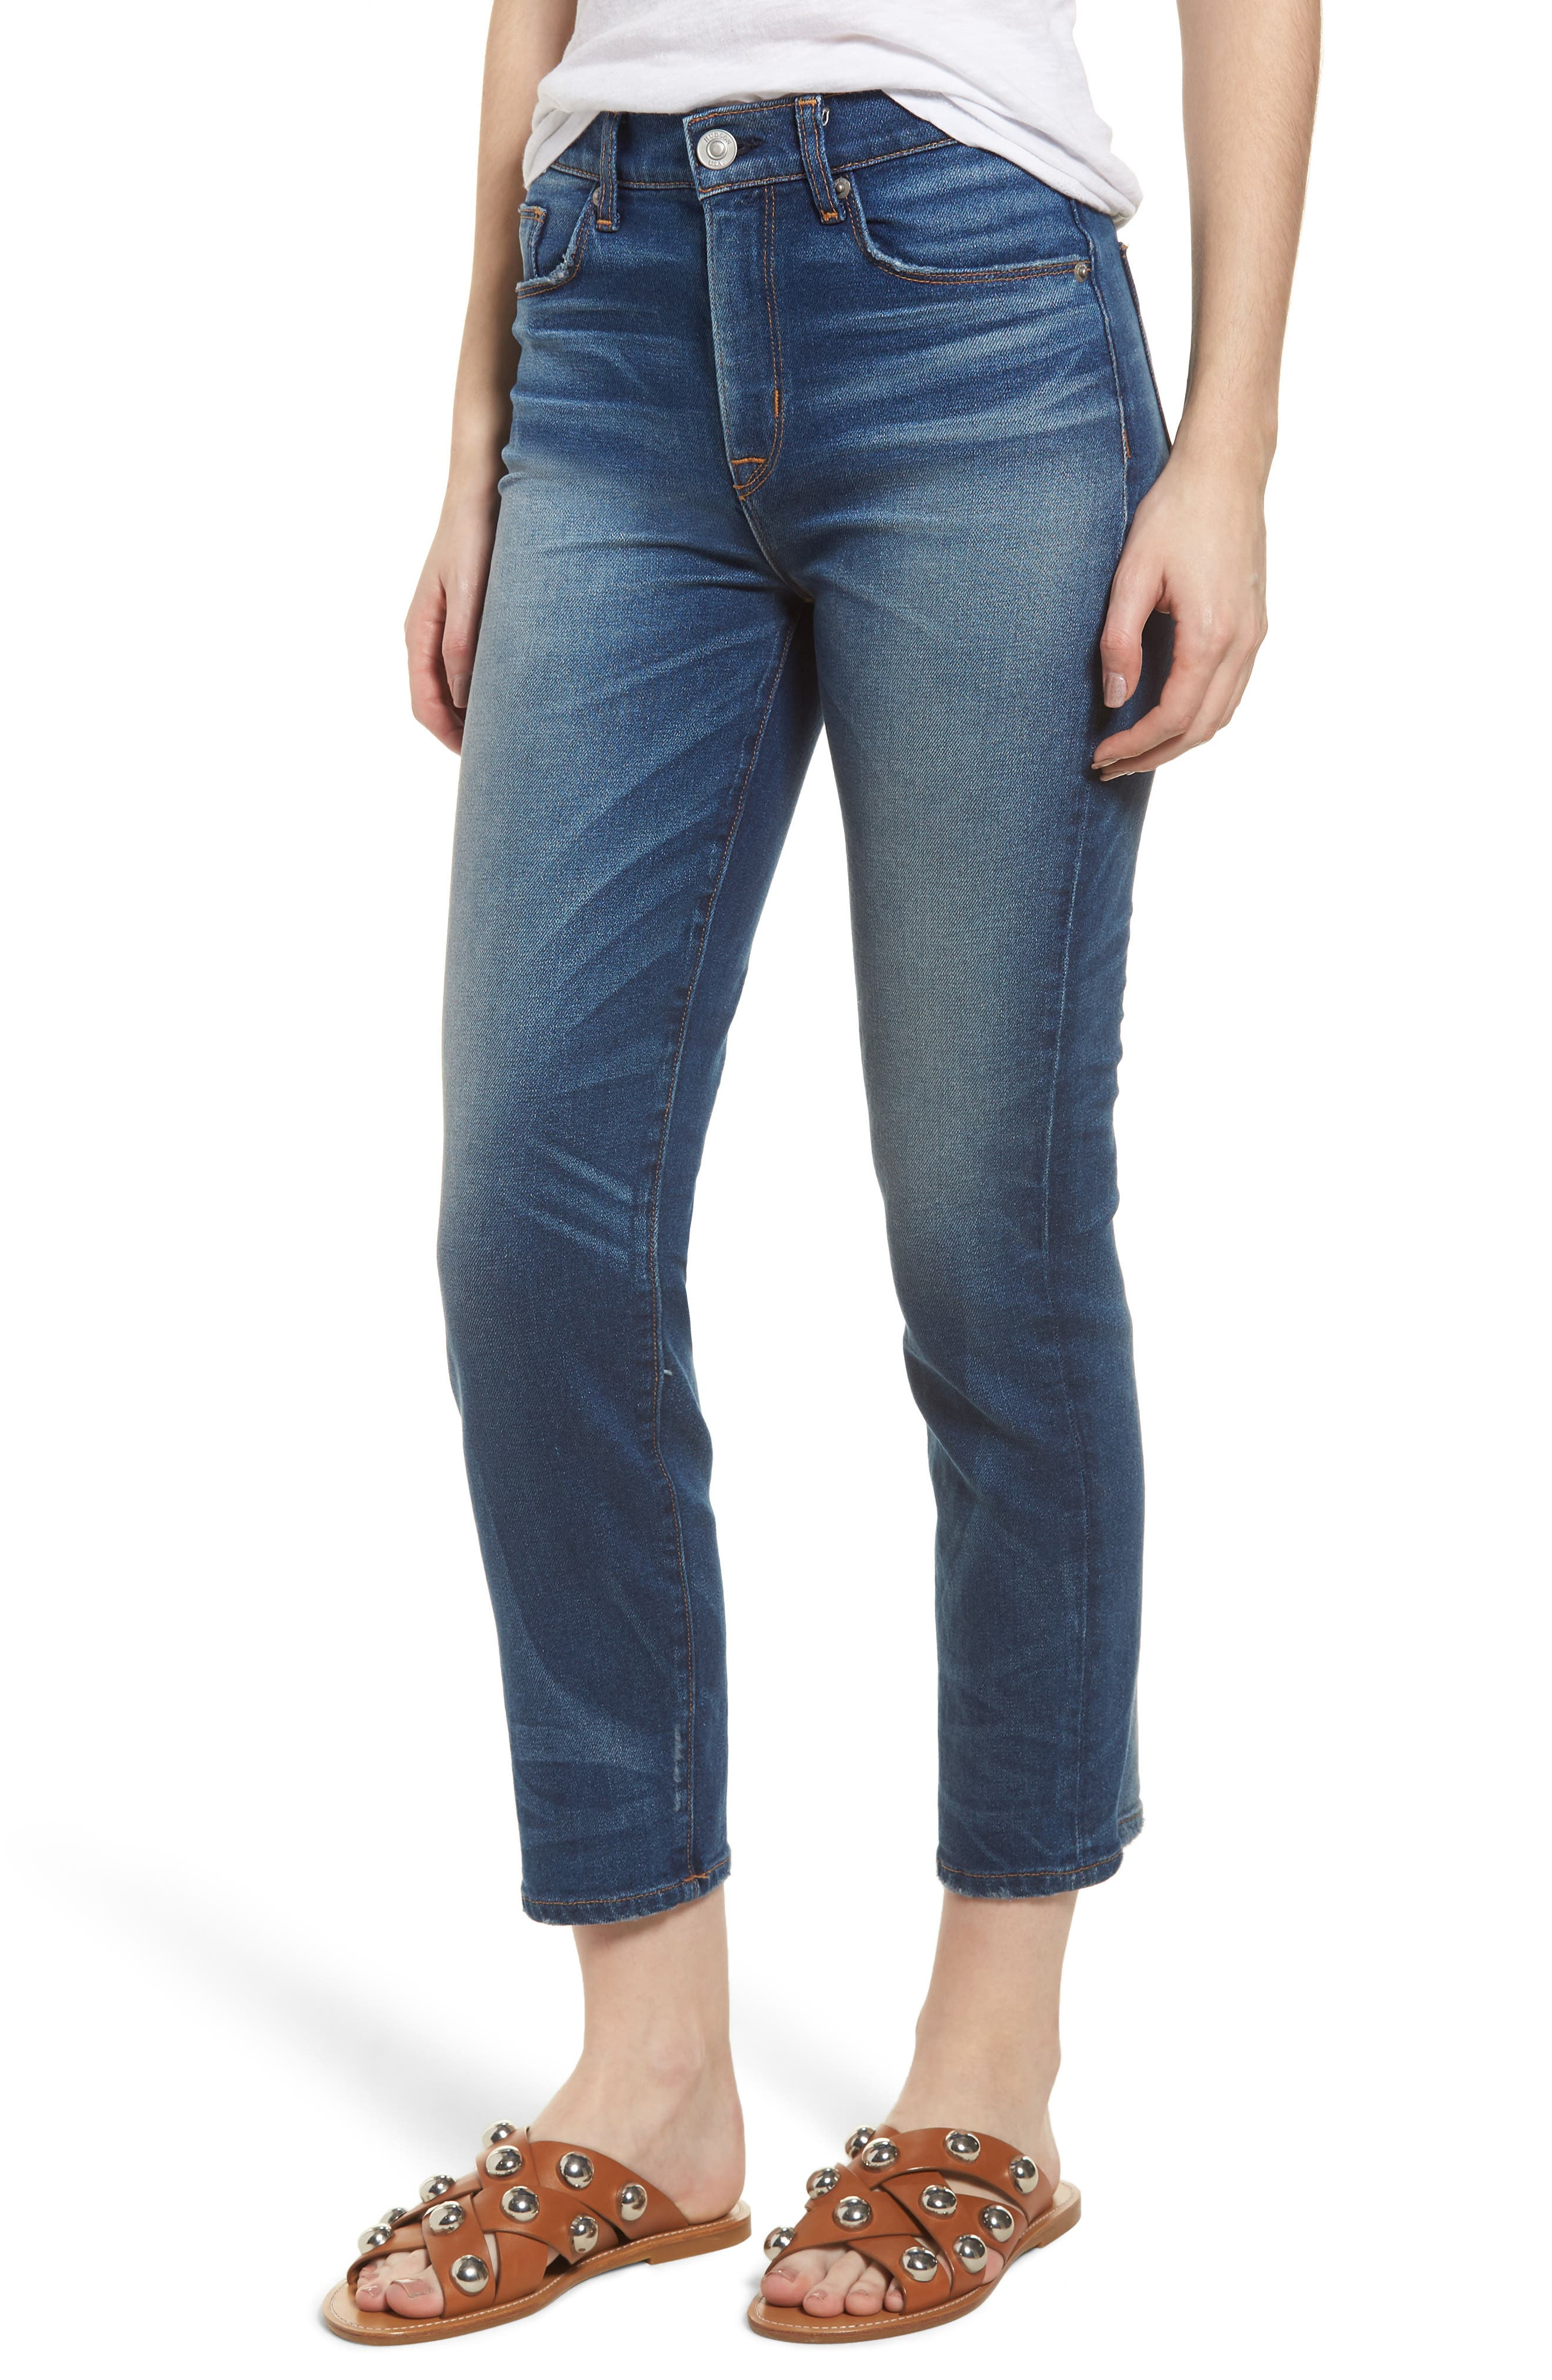 Zoeey High Waist Crop Straight Leg Jeans,                             Main thumbnail 1, color,                             420